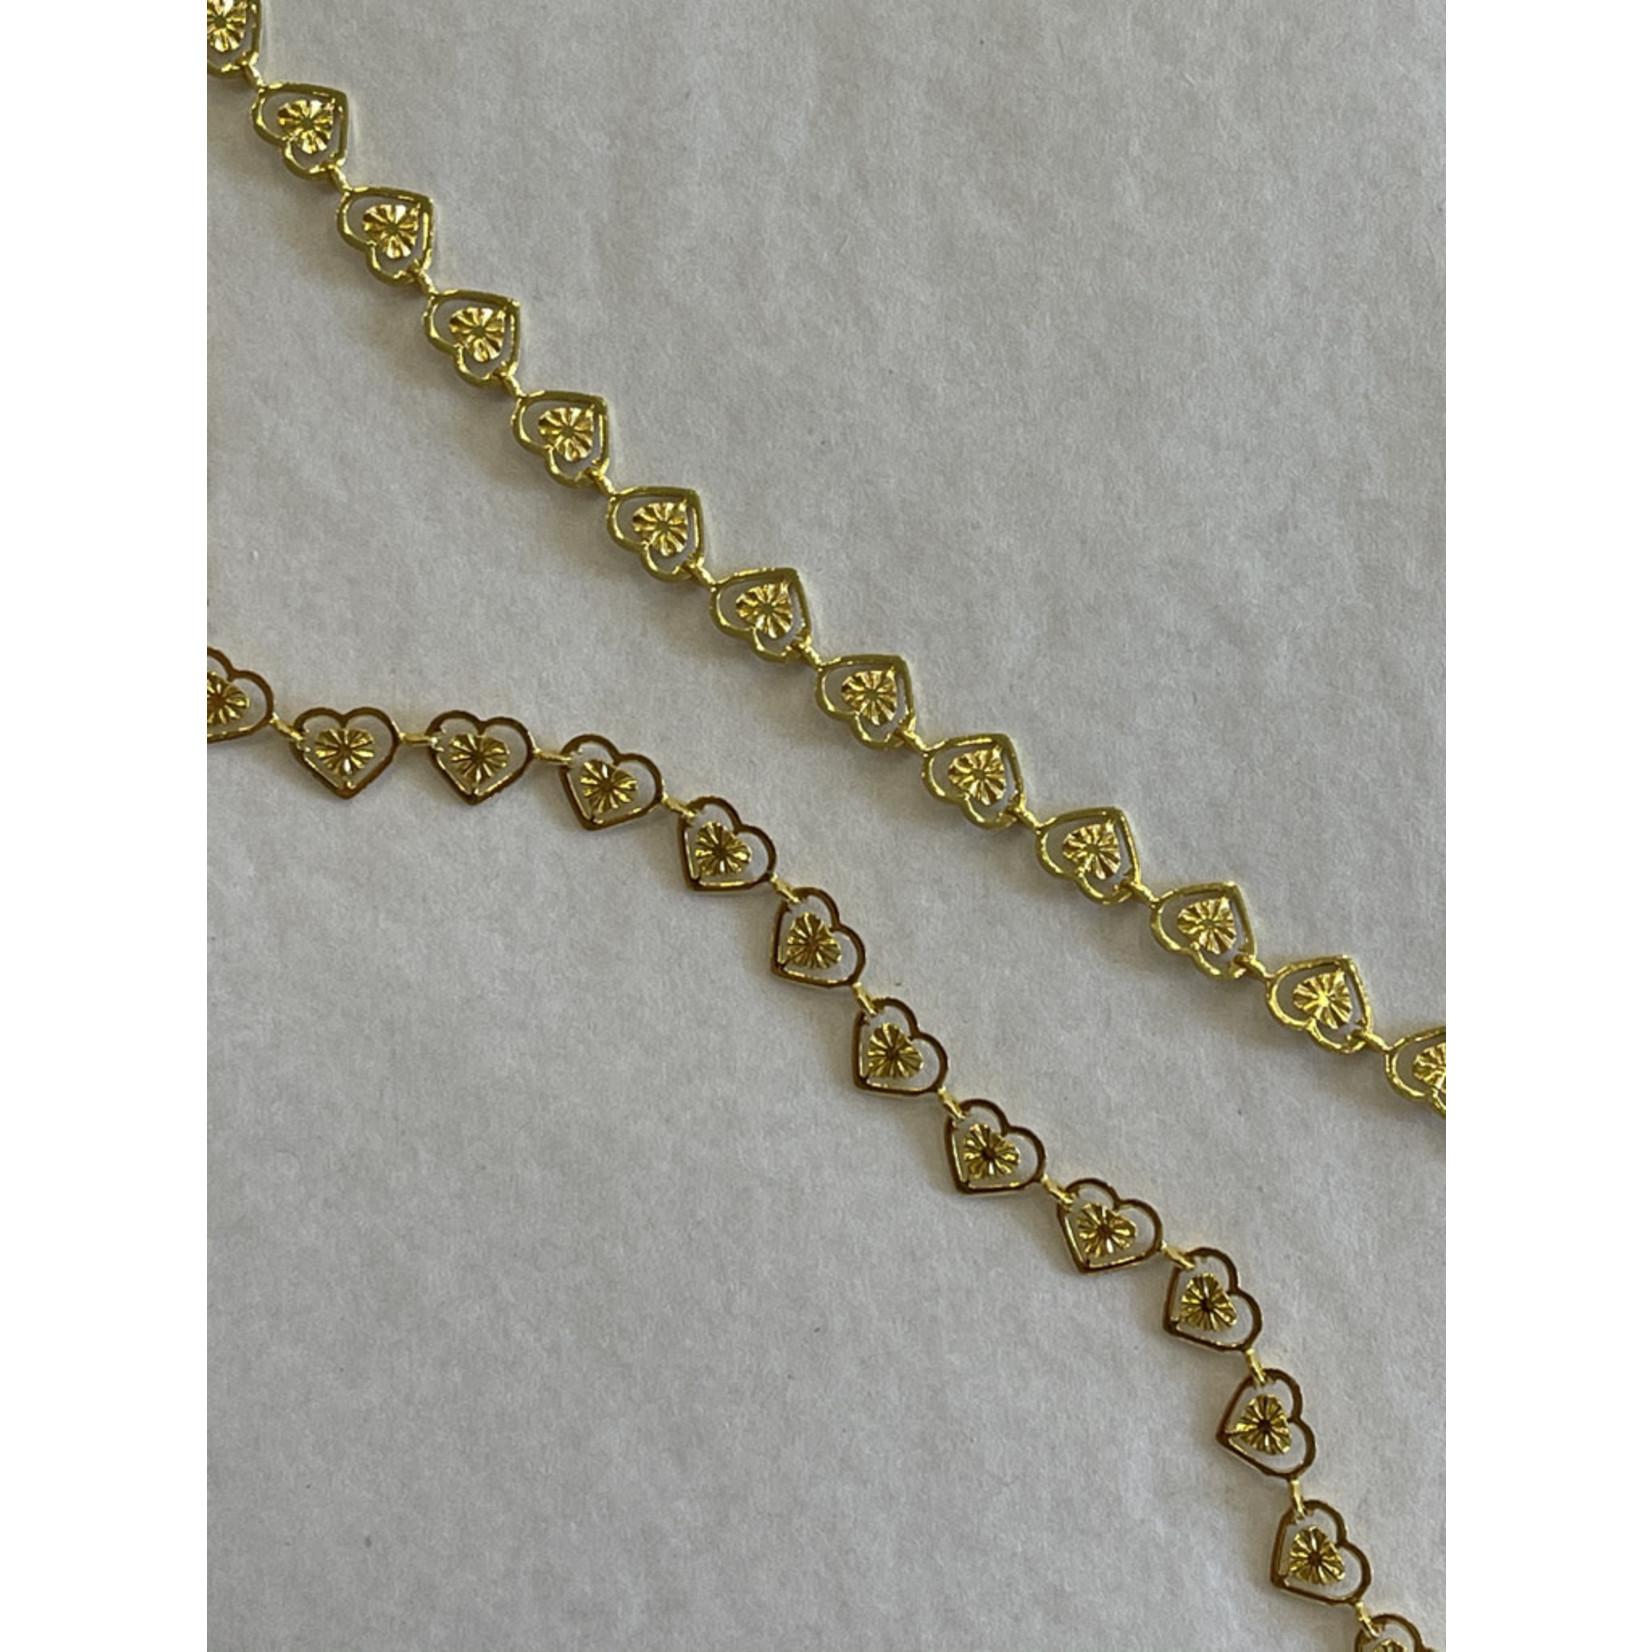 Wyld Blue Heart Sunglass Chain